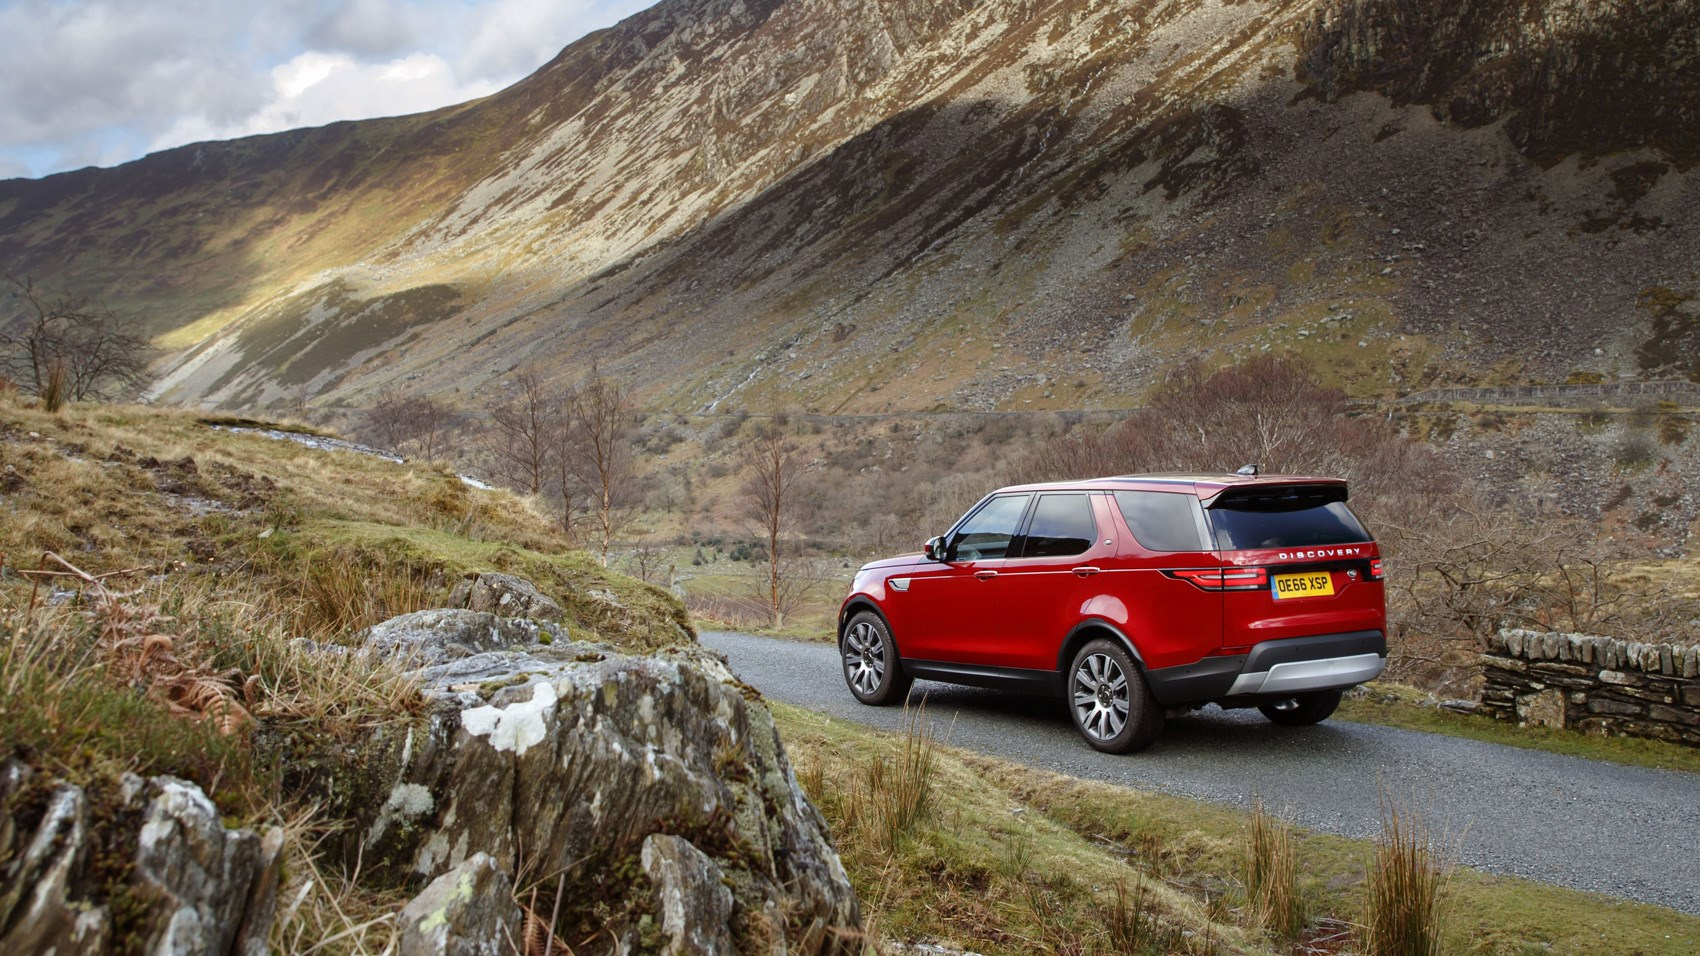 Land Rover Discovery sD4 rear quarter